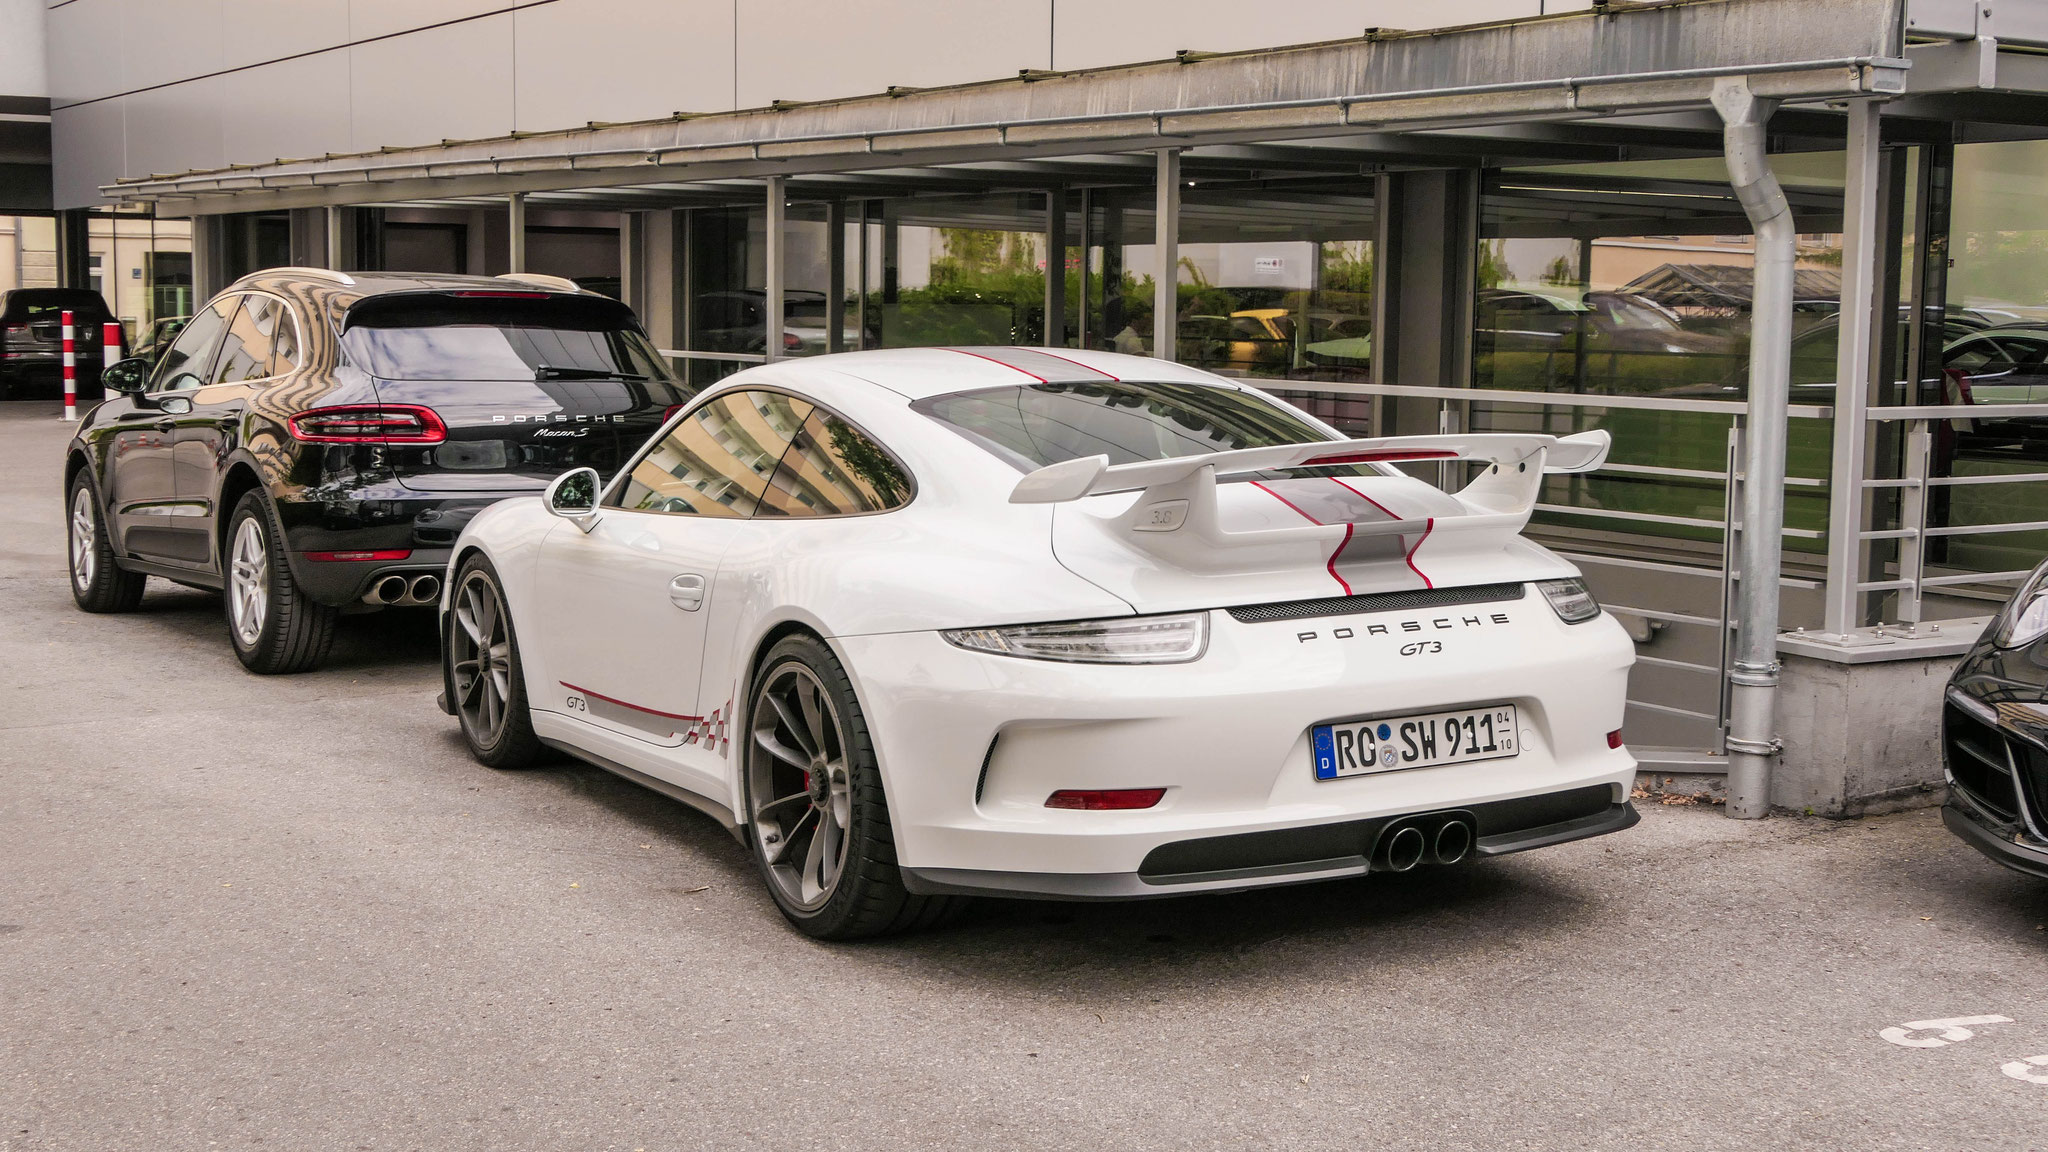 Porsche 991 GT3 - RO-SW-911